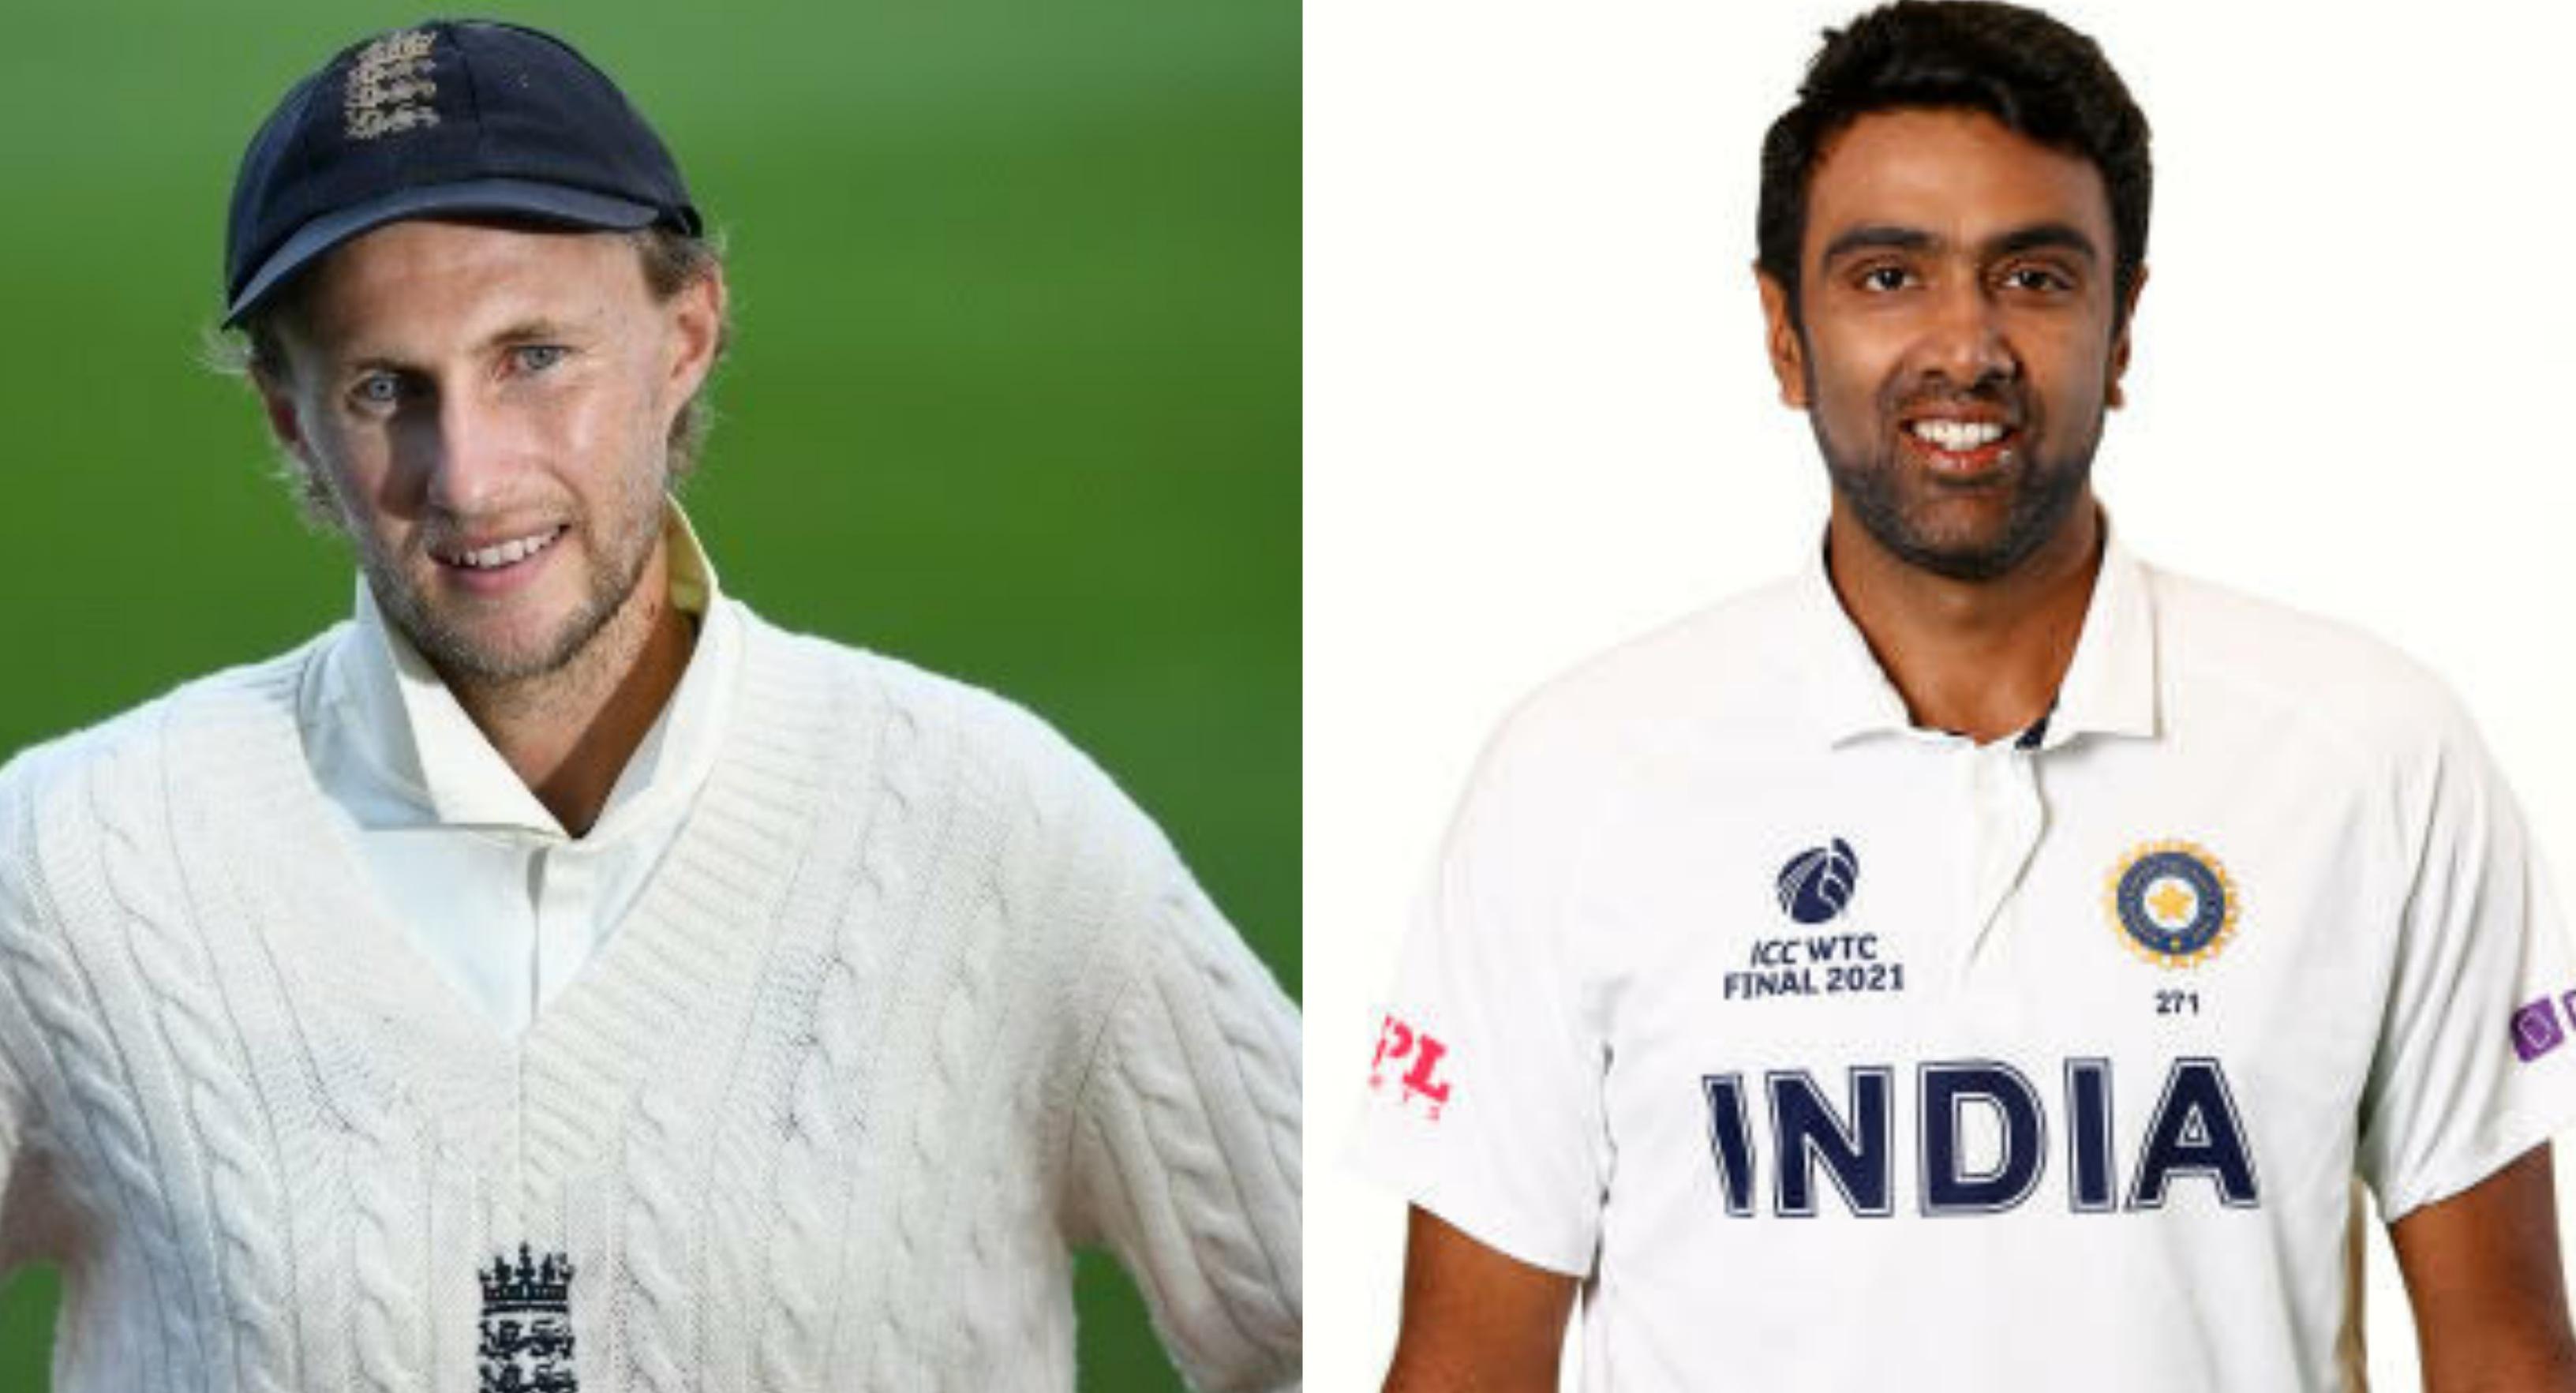 Joe Root and Ravichandran Ashwin